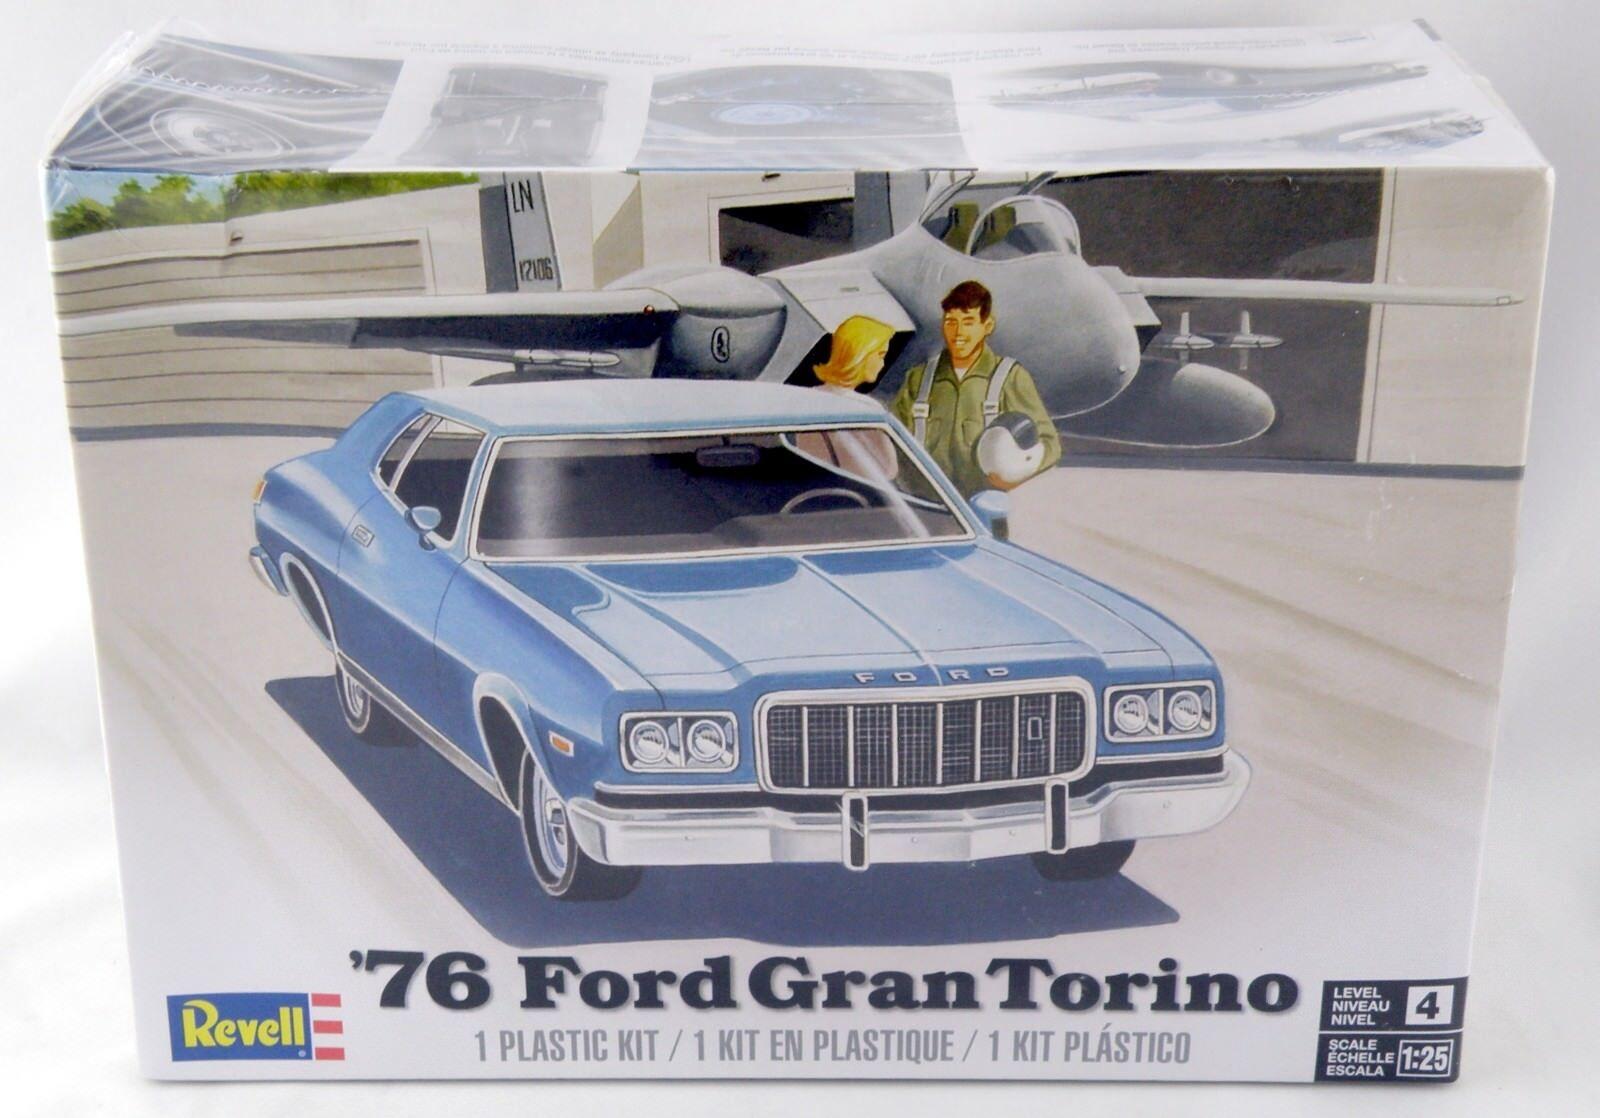 REVELL 4412 1:25th échelle 76 Ford Gran Torino